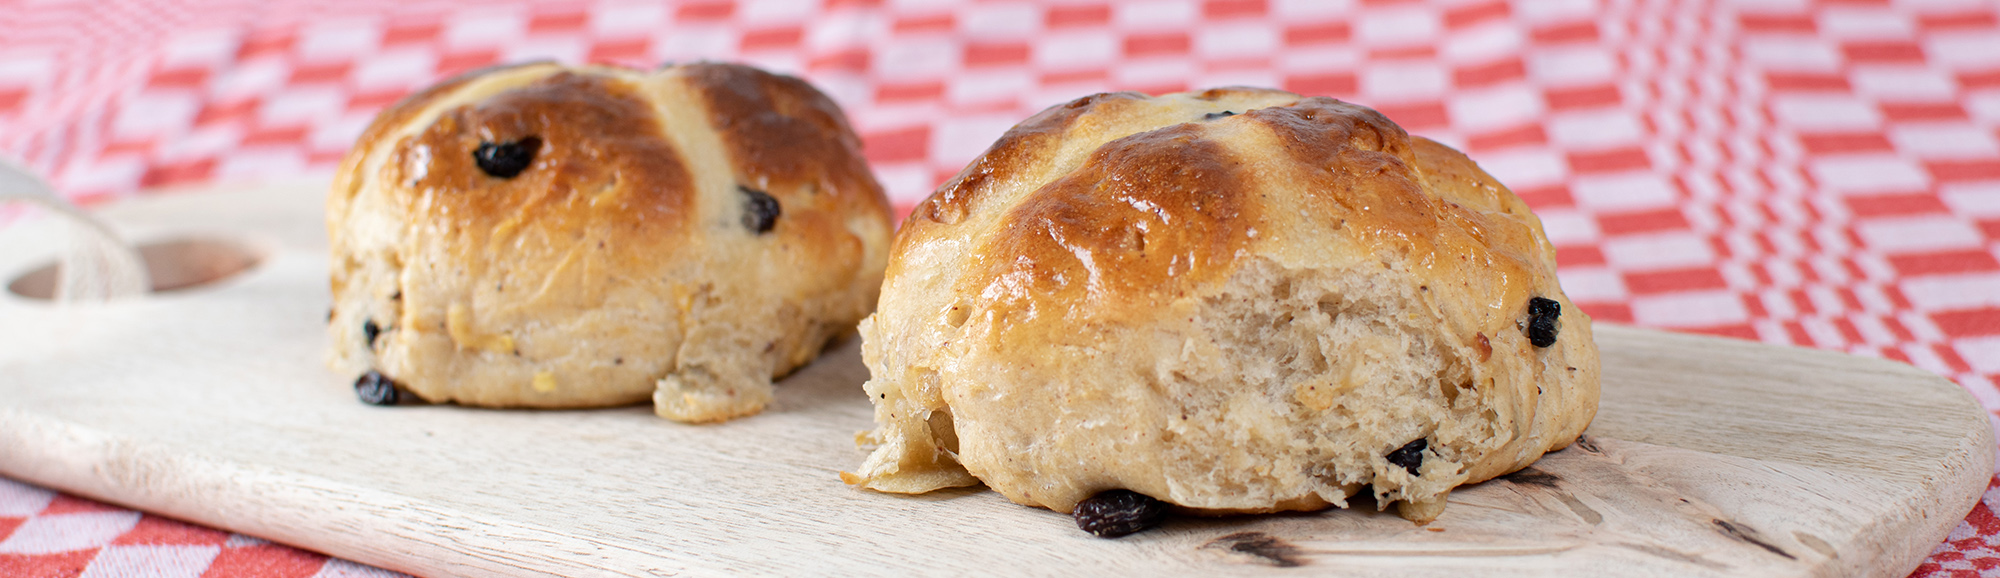 Paasbroodjes of hot cross buns recept van Bakmuts